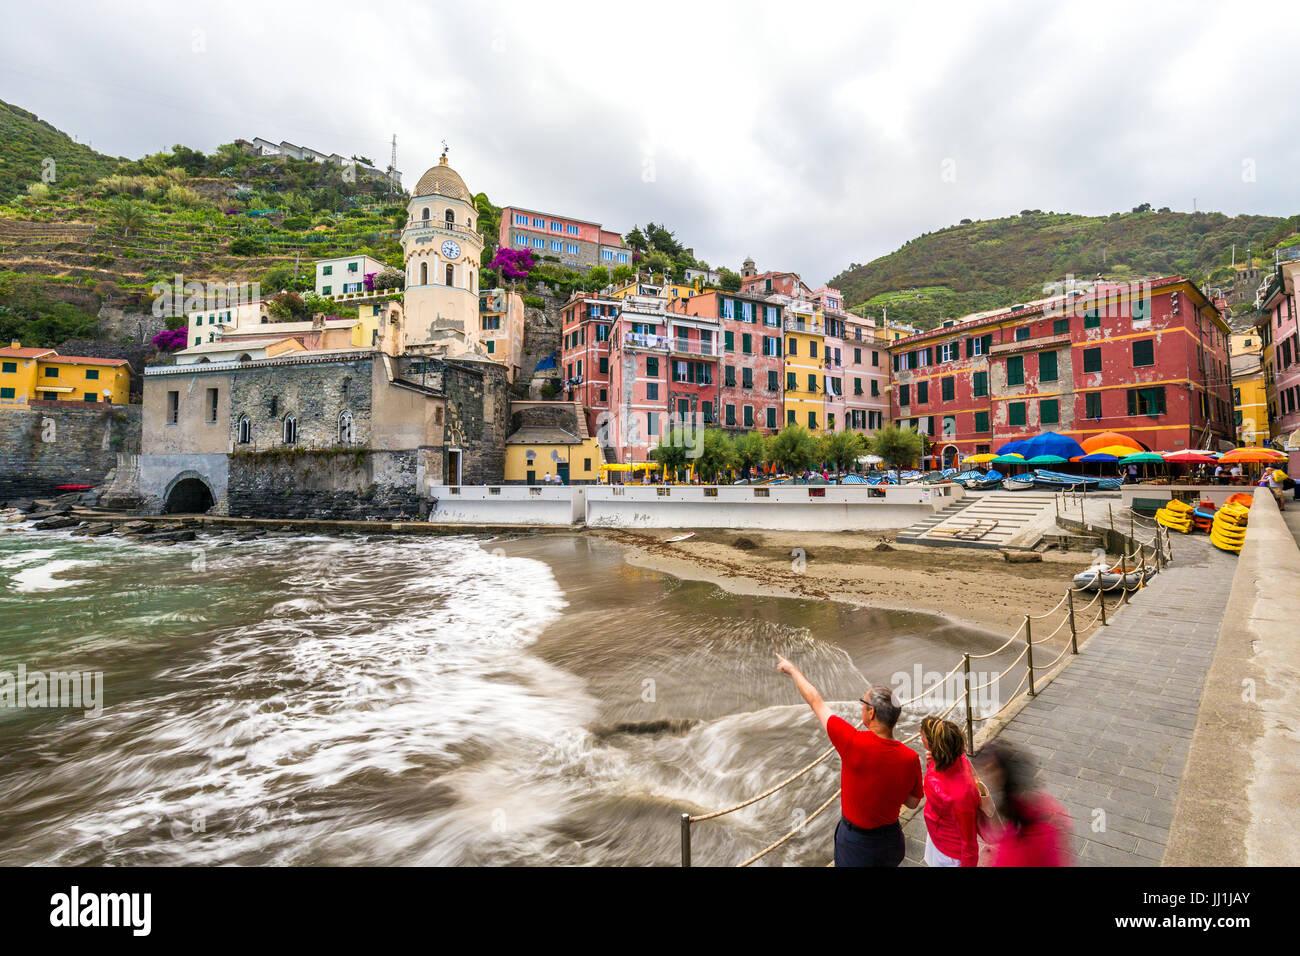 Vernazza, eines der berühmten Cinque Terre in Ligurien, Italien Stockfoto